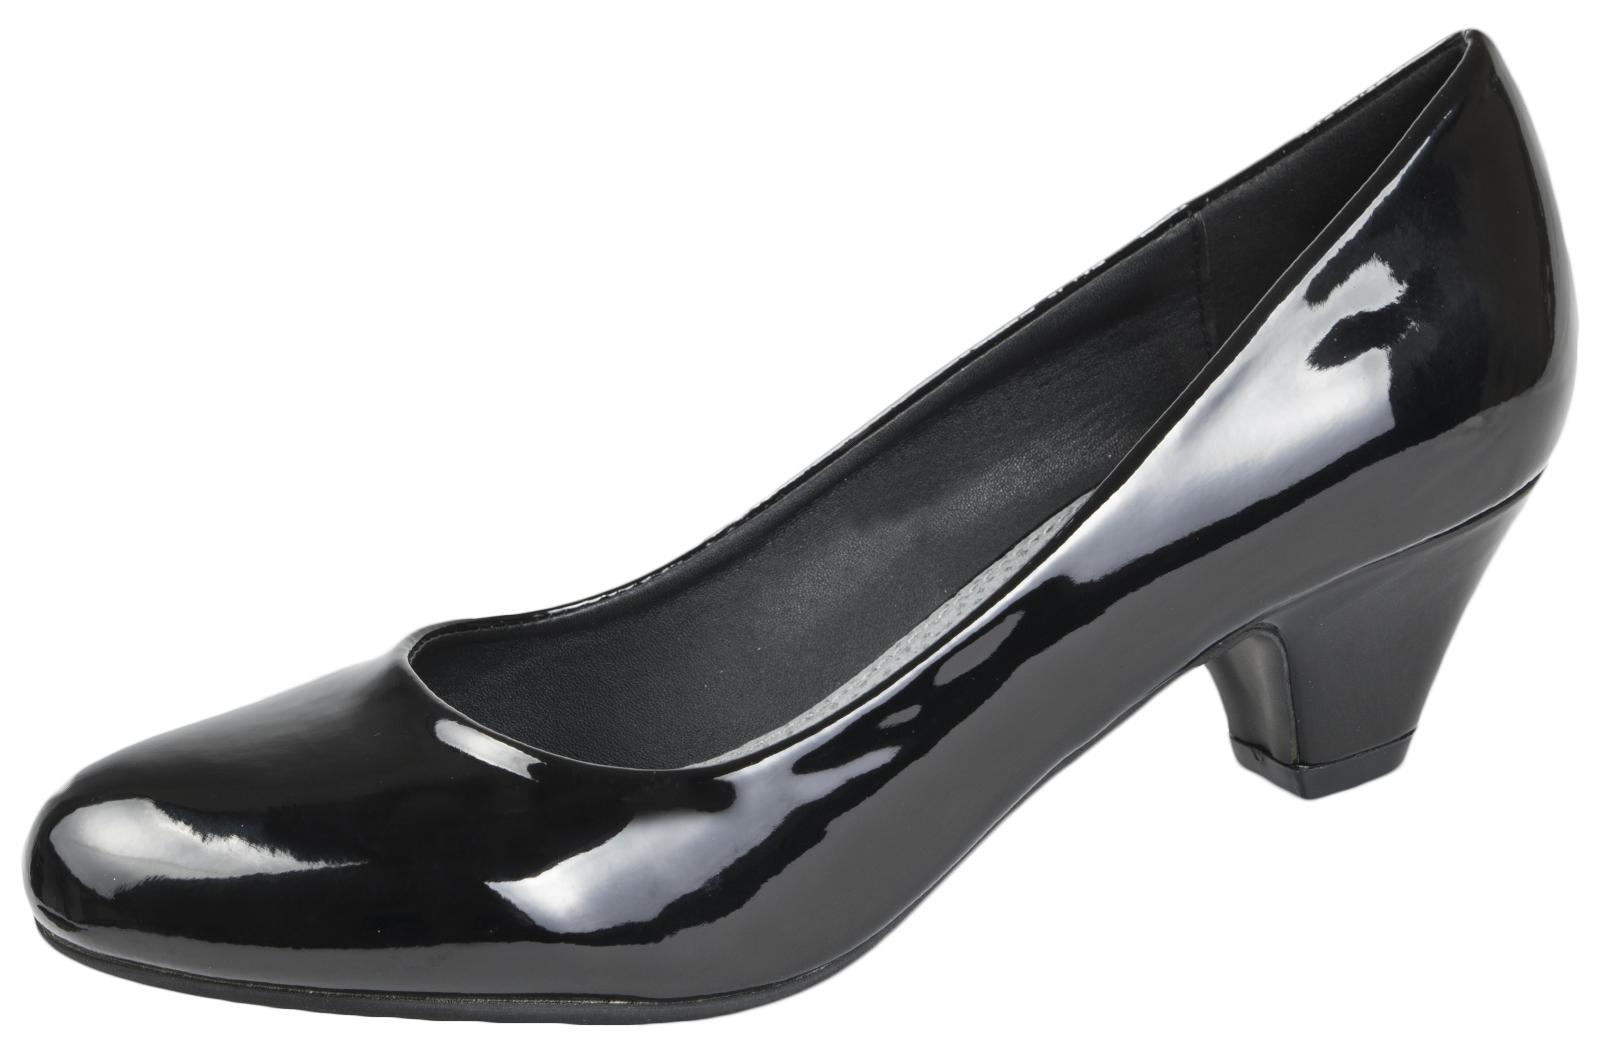 Ladies-Leather-Lined-Low-Block-Heels-Comfort-Work-Office-Court-Shoes-Ladies-Size miniatuur 31